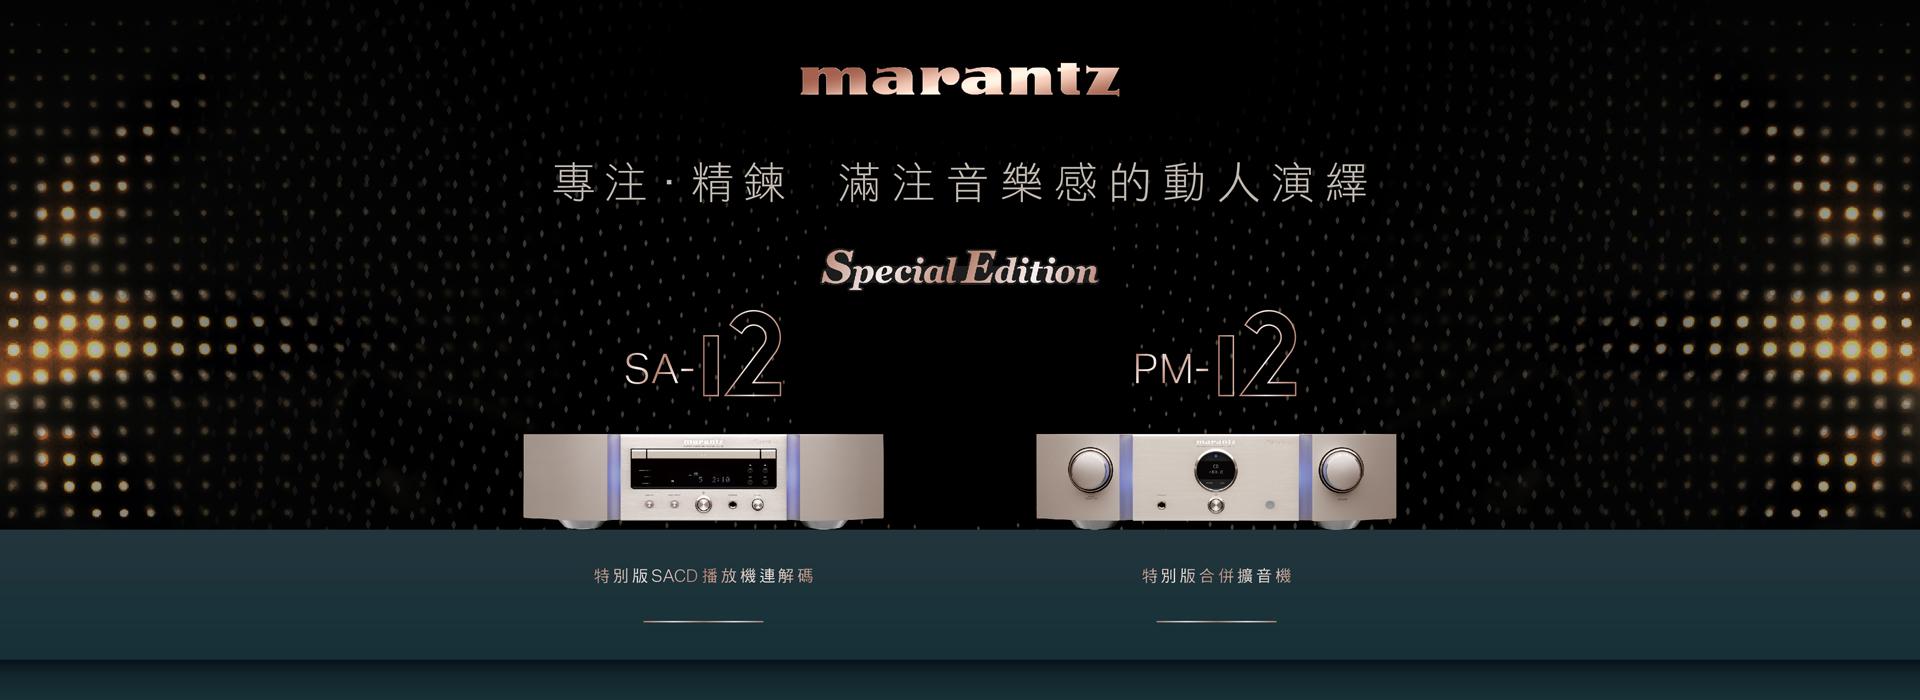 Marantz Special Edition